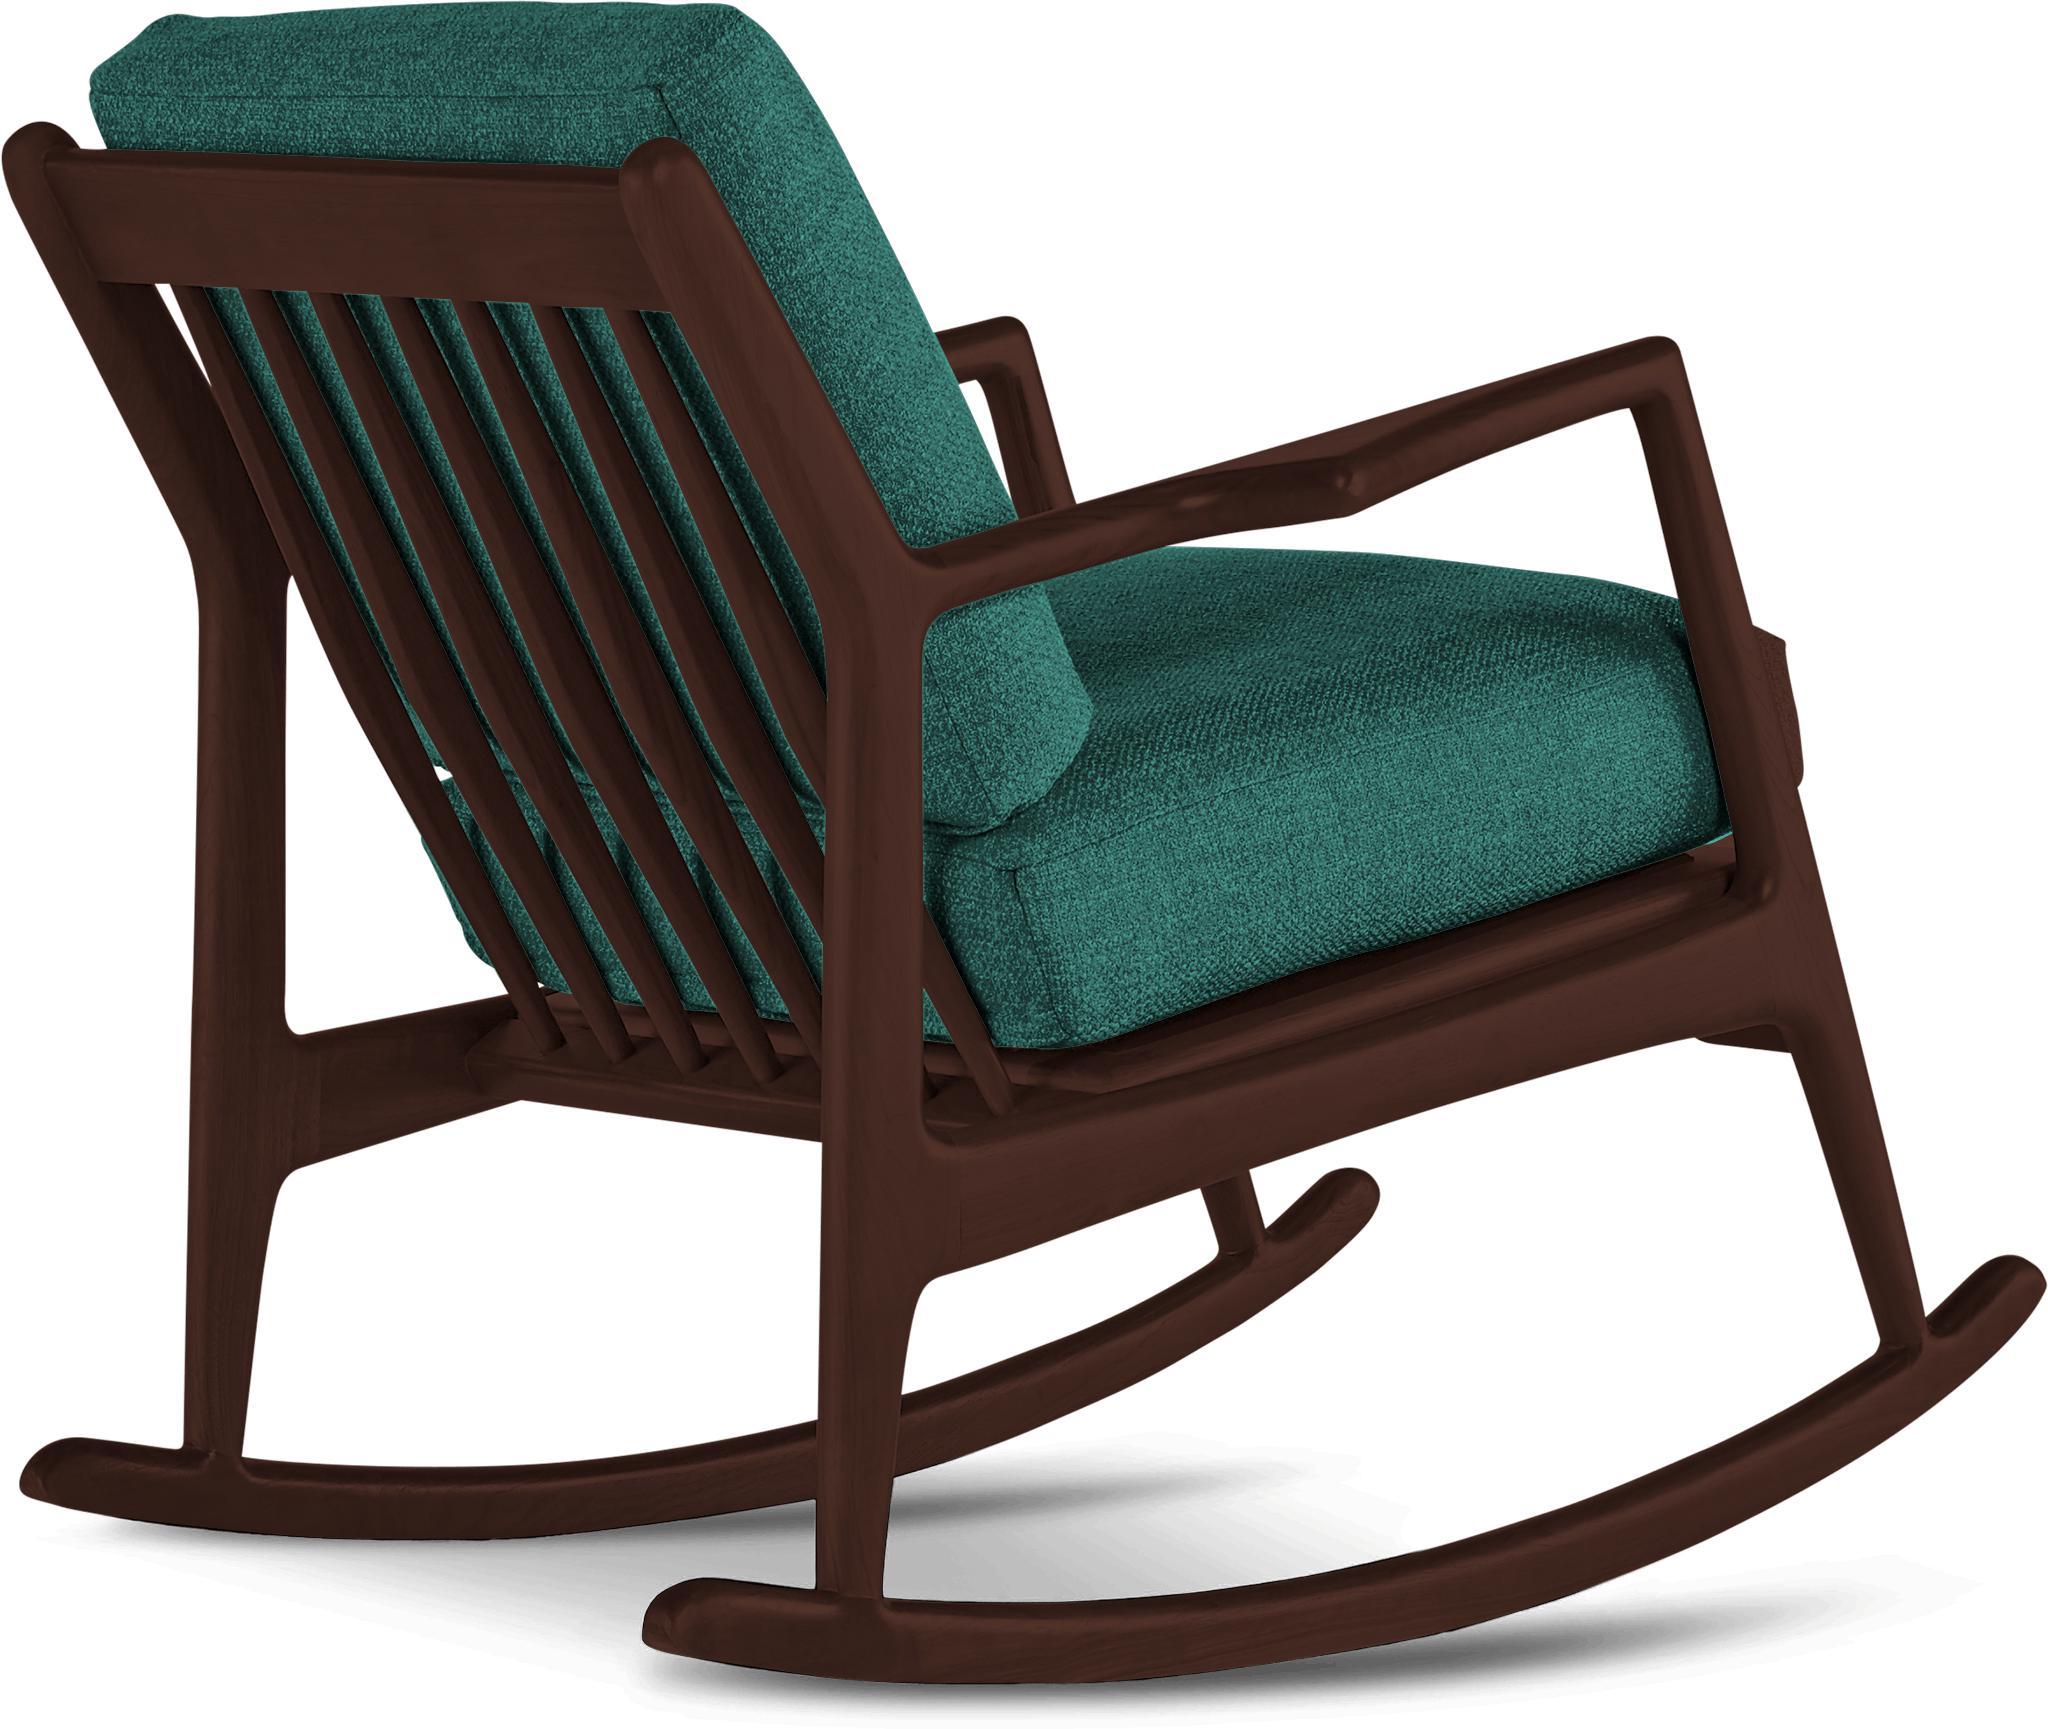 Blue Collins Mid Century Modern Rocking Chair - Prime Peacock - Walnut